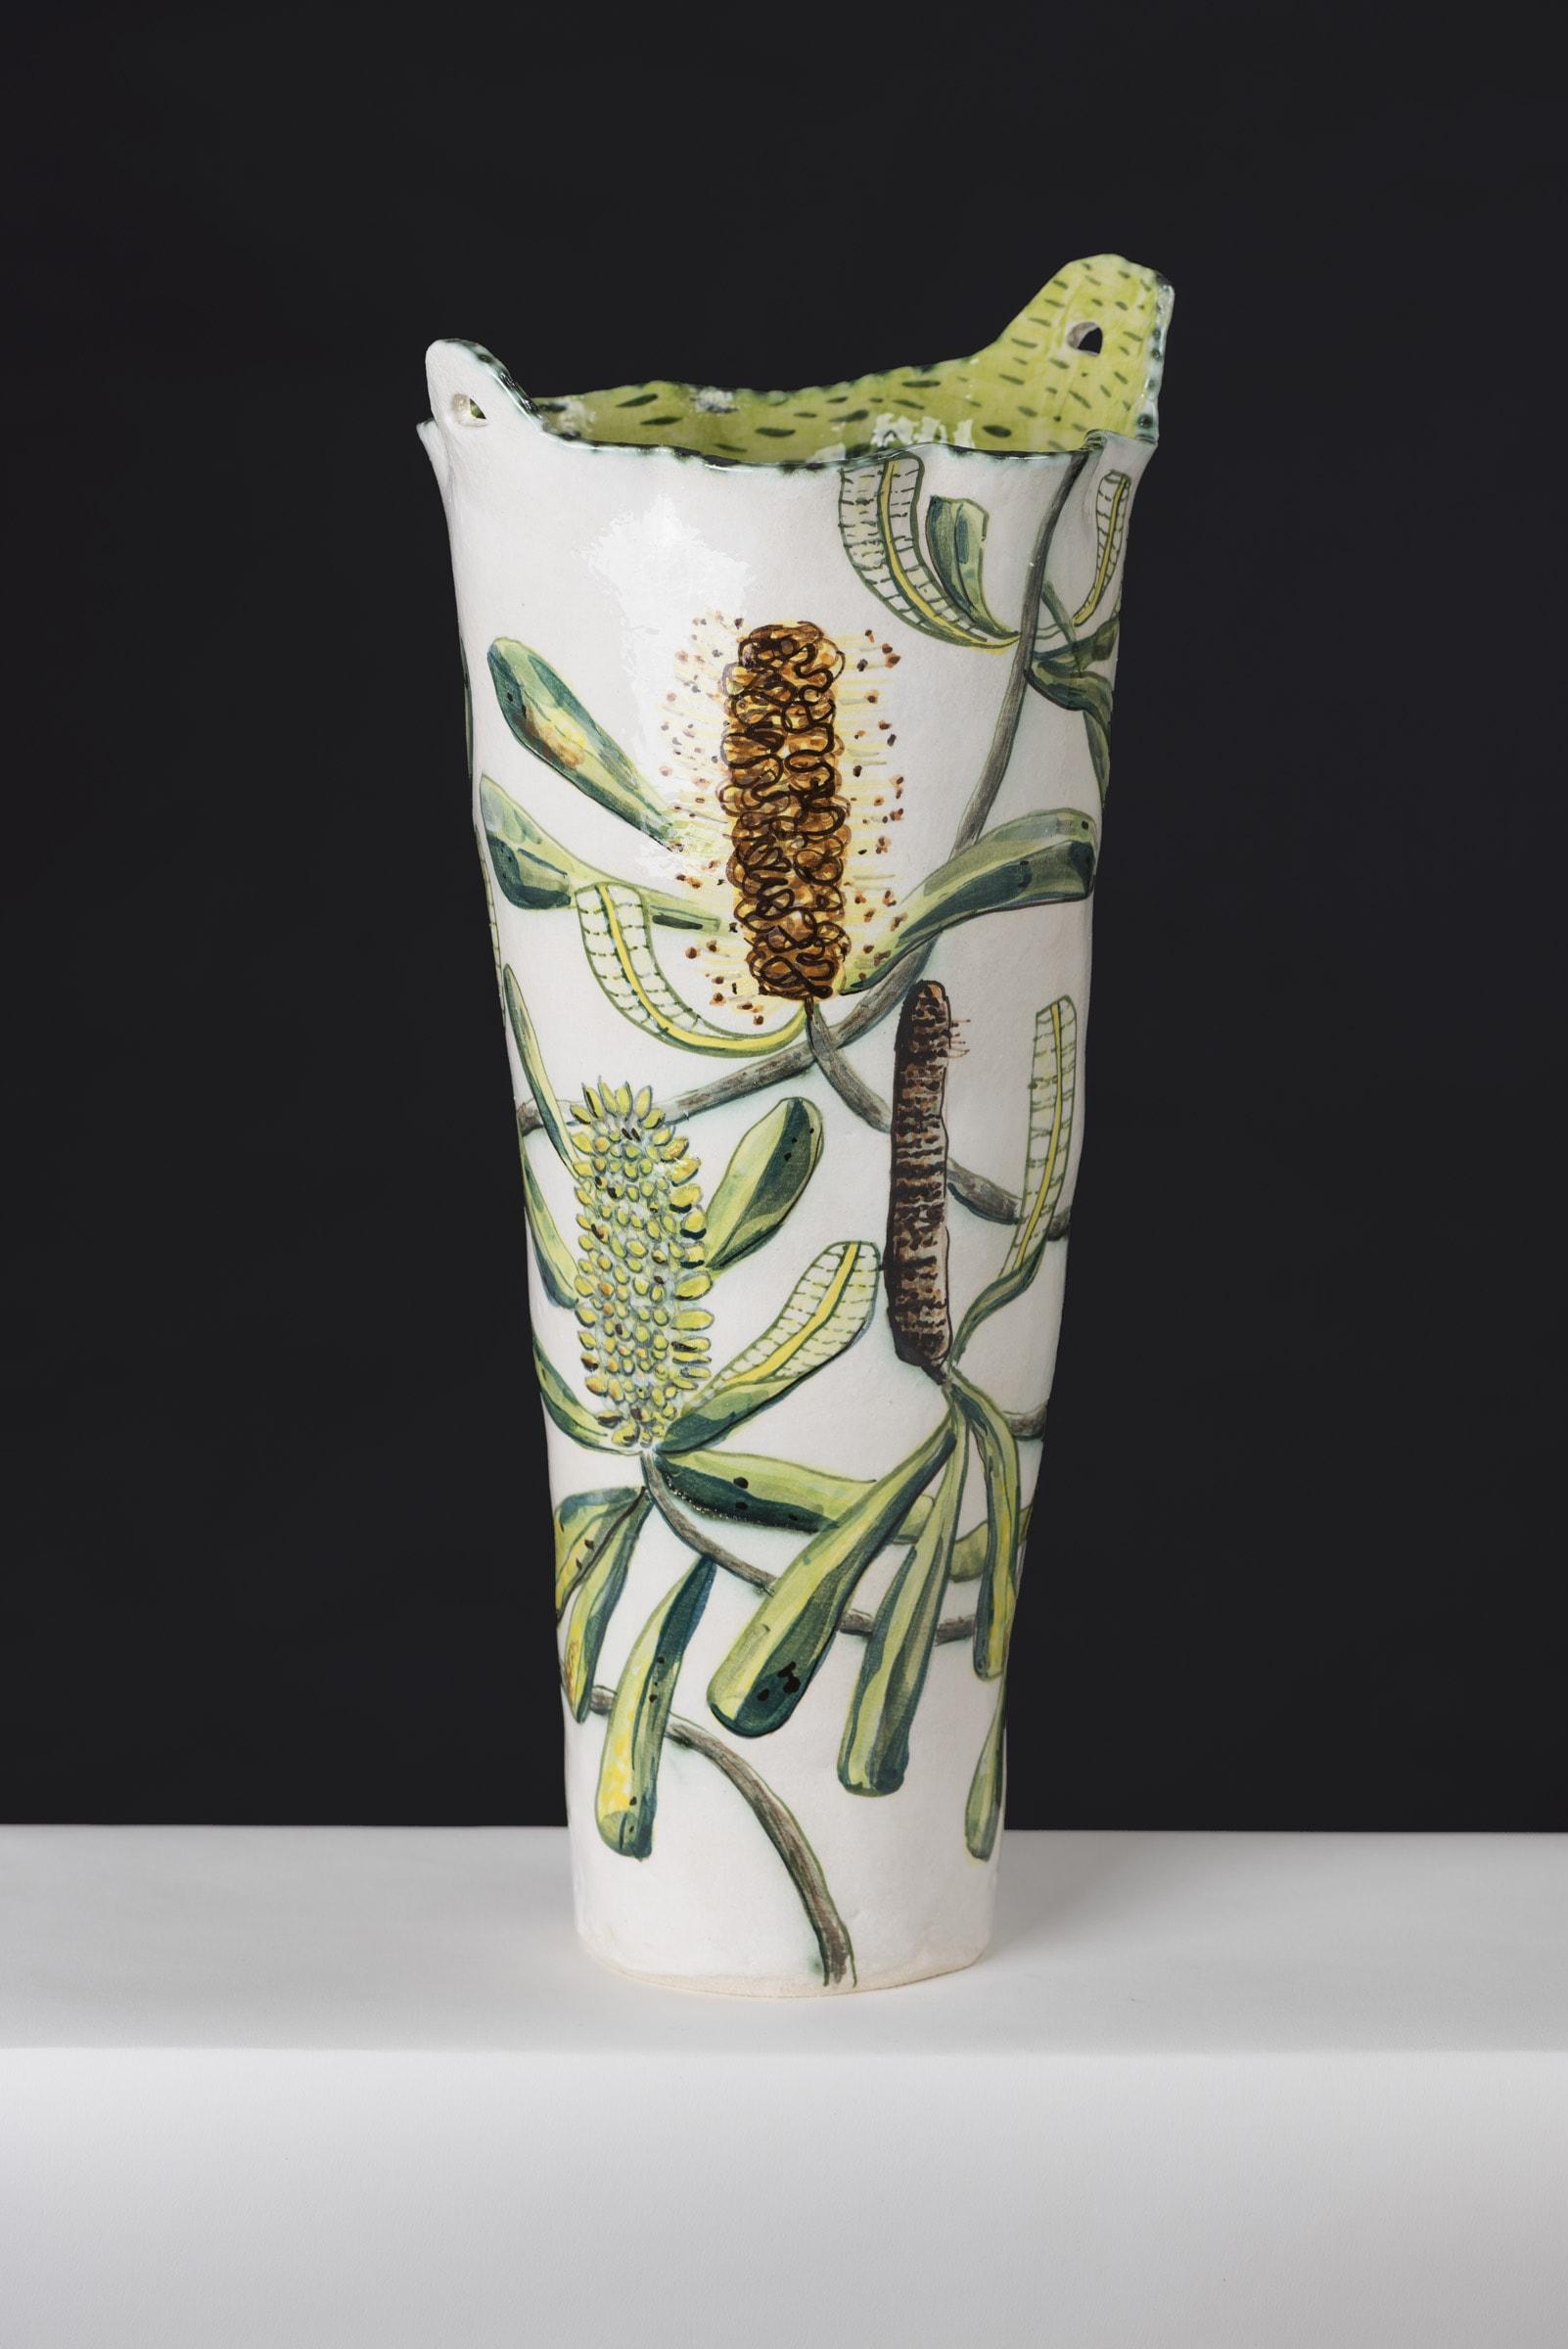 Fiona Hiscock, Banksia Vase, 2017, Stoneware, 41cm High, View 2